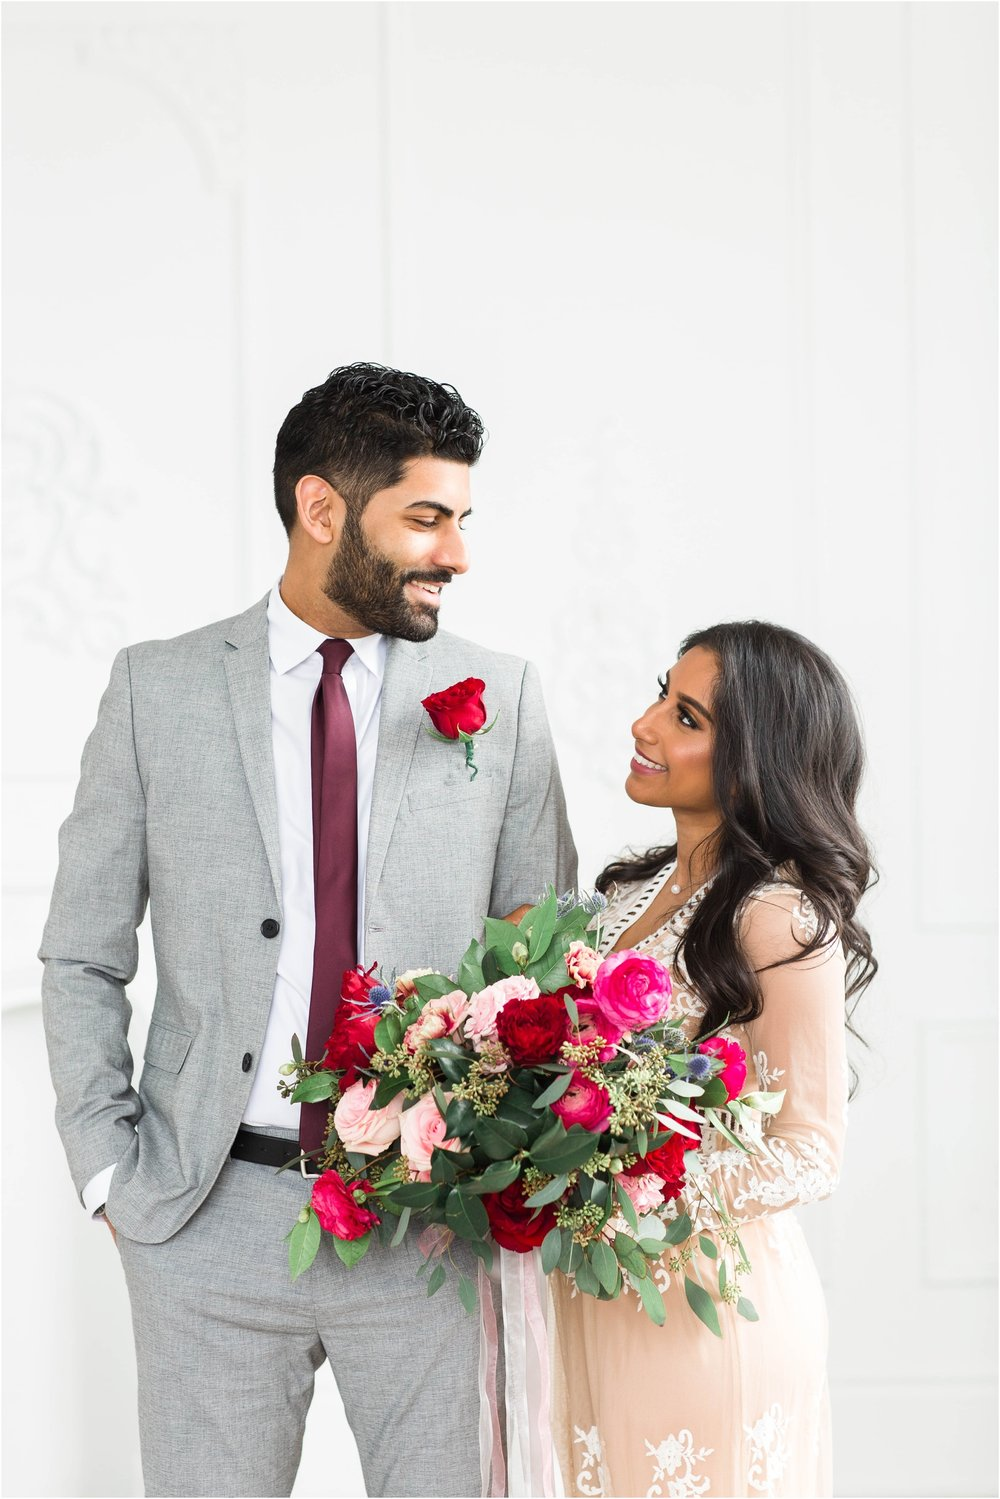 Mint-Room-Studios-Anniversary-Session-Toronto-Mississauga-Brampton-Scarborough-GTA-Pakistani-Indian-Wedding-Engagement-Photographer-Photography_0004.jpg